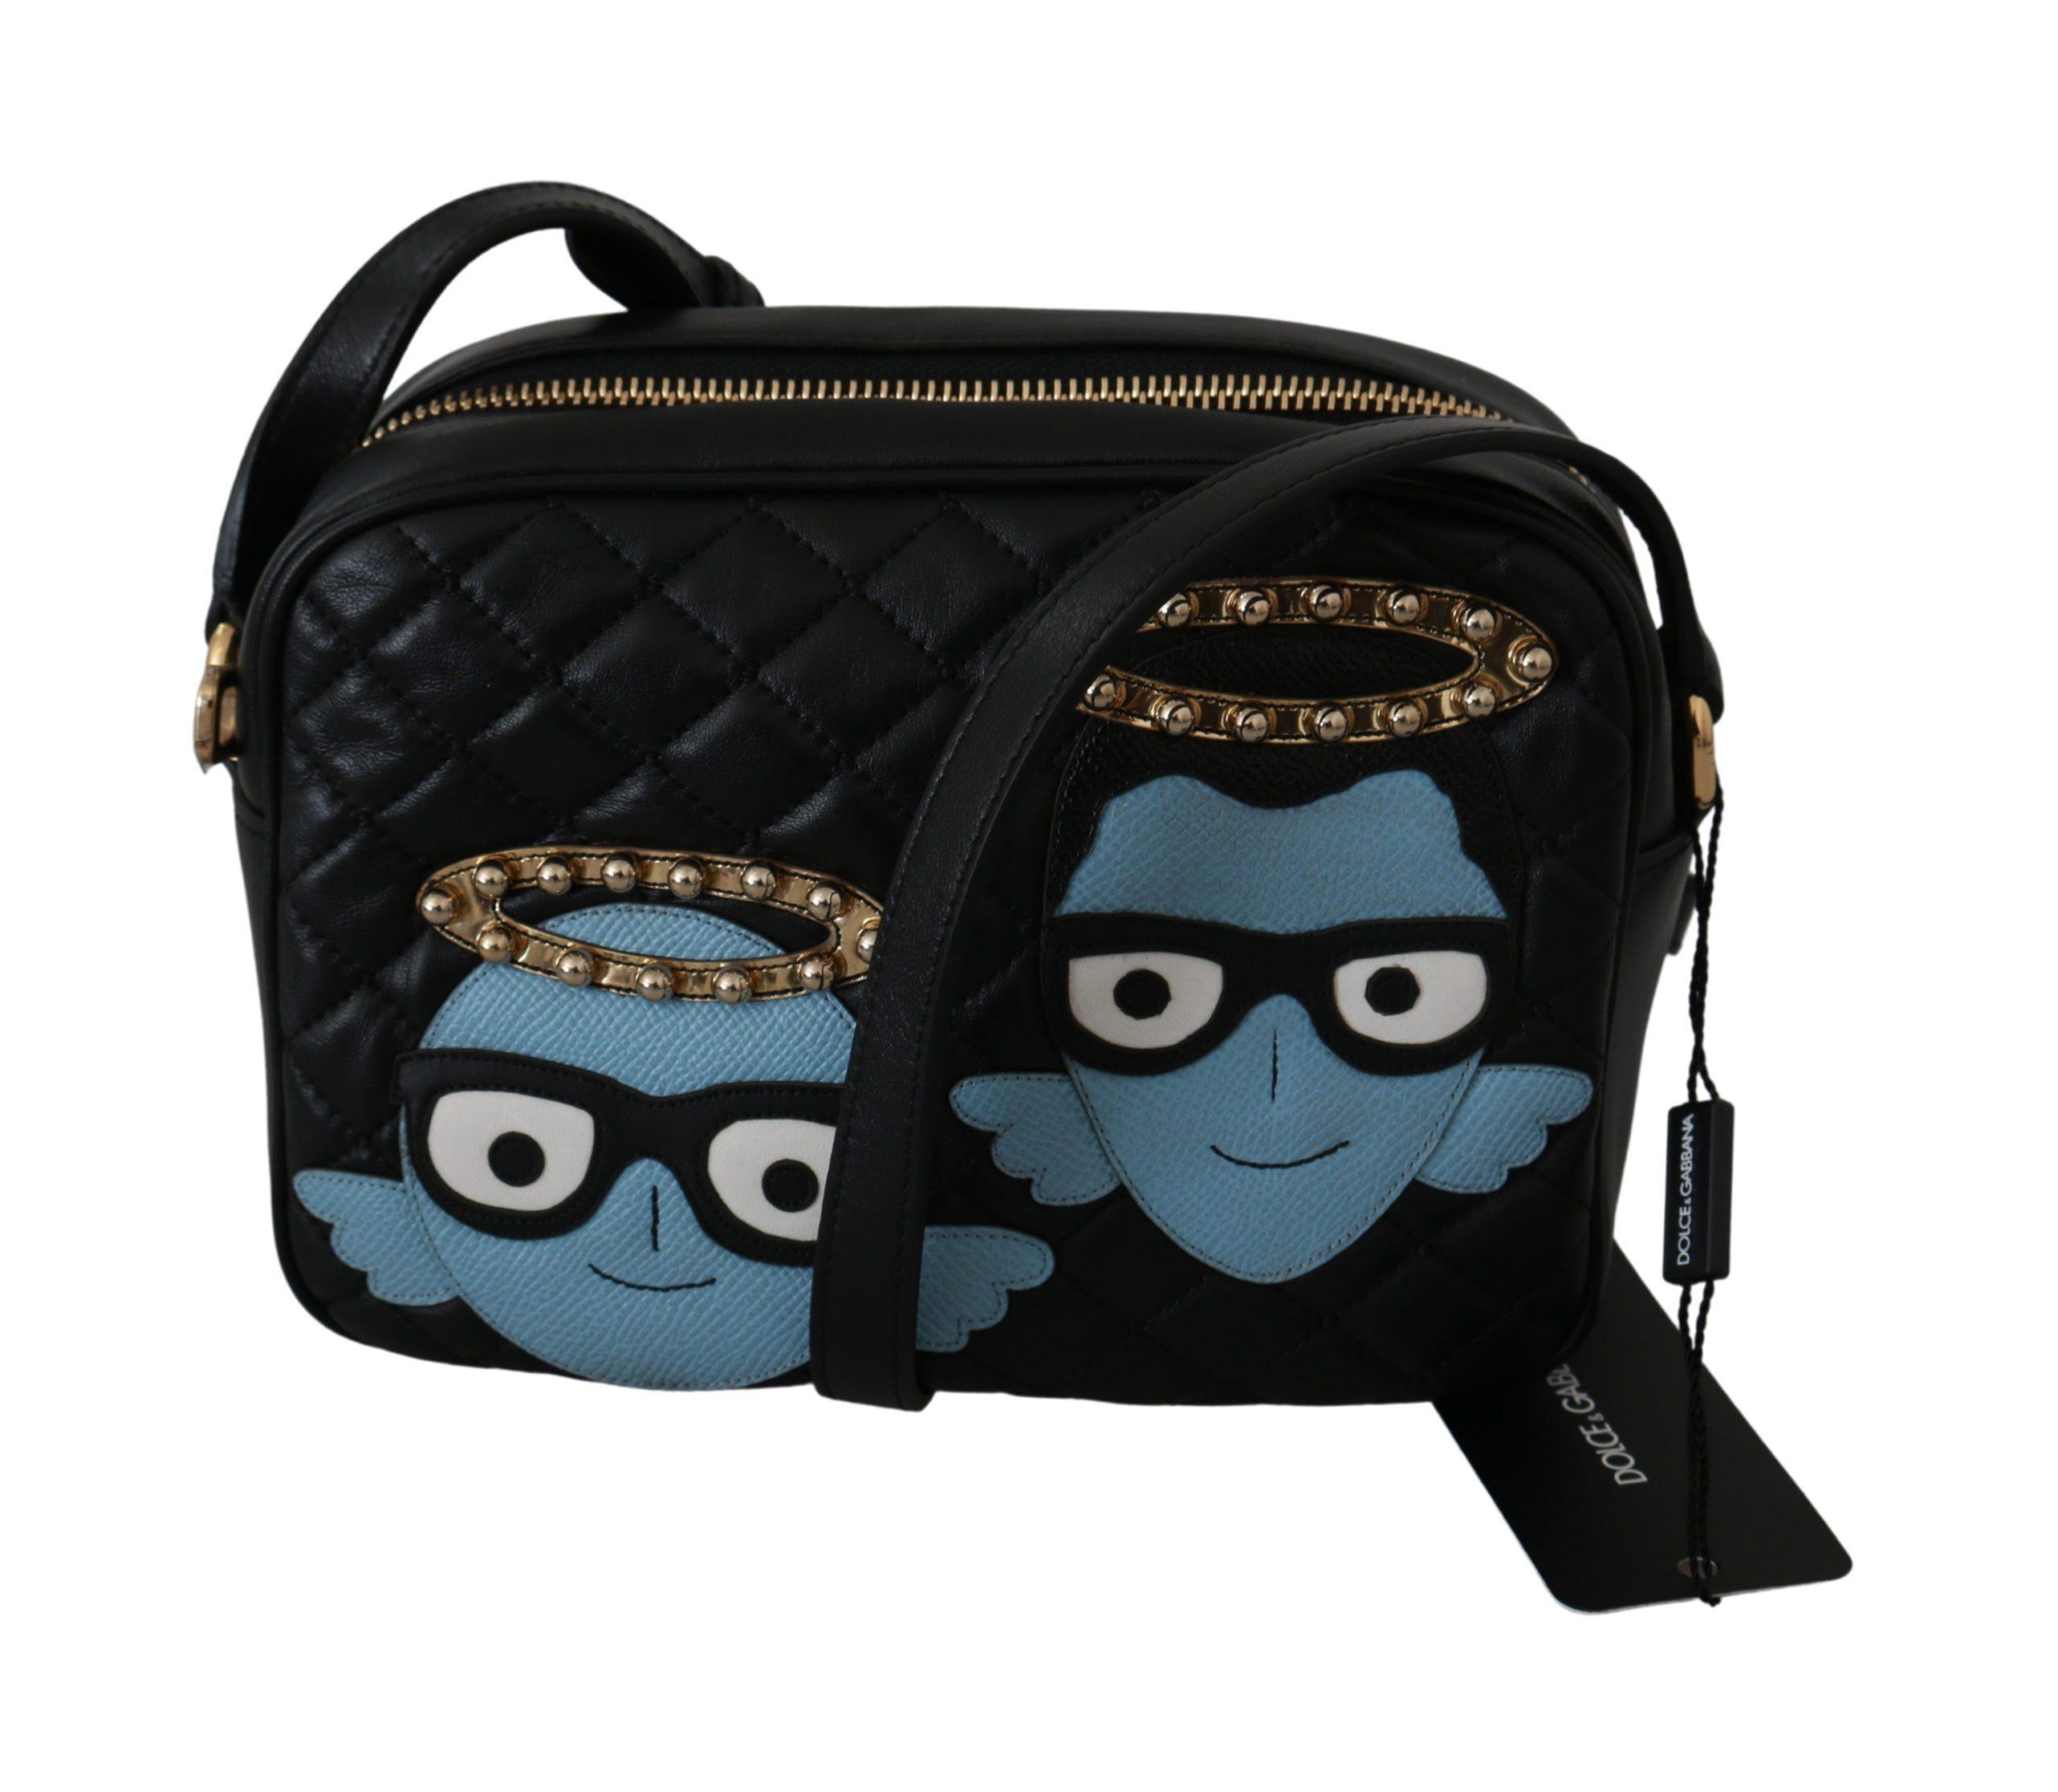 Dolce & Gabbana Women's Angel Patch GLAM Leather Crossbody Bag Black VAS9201